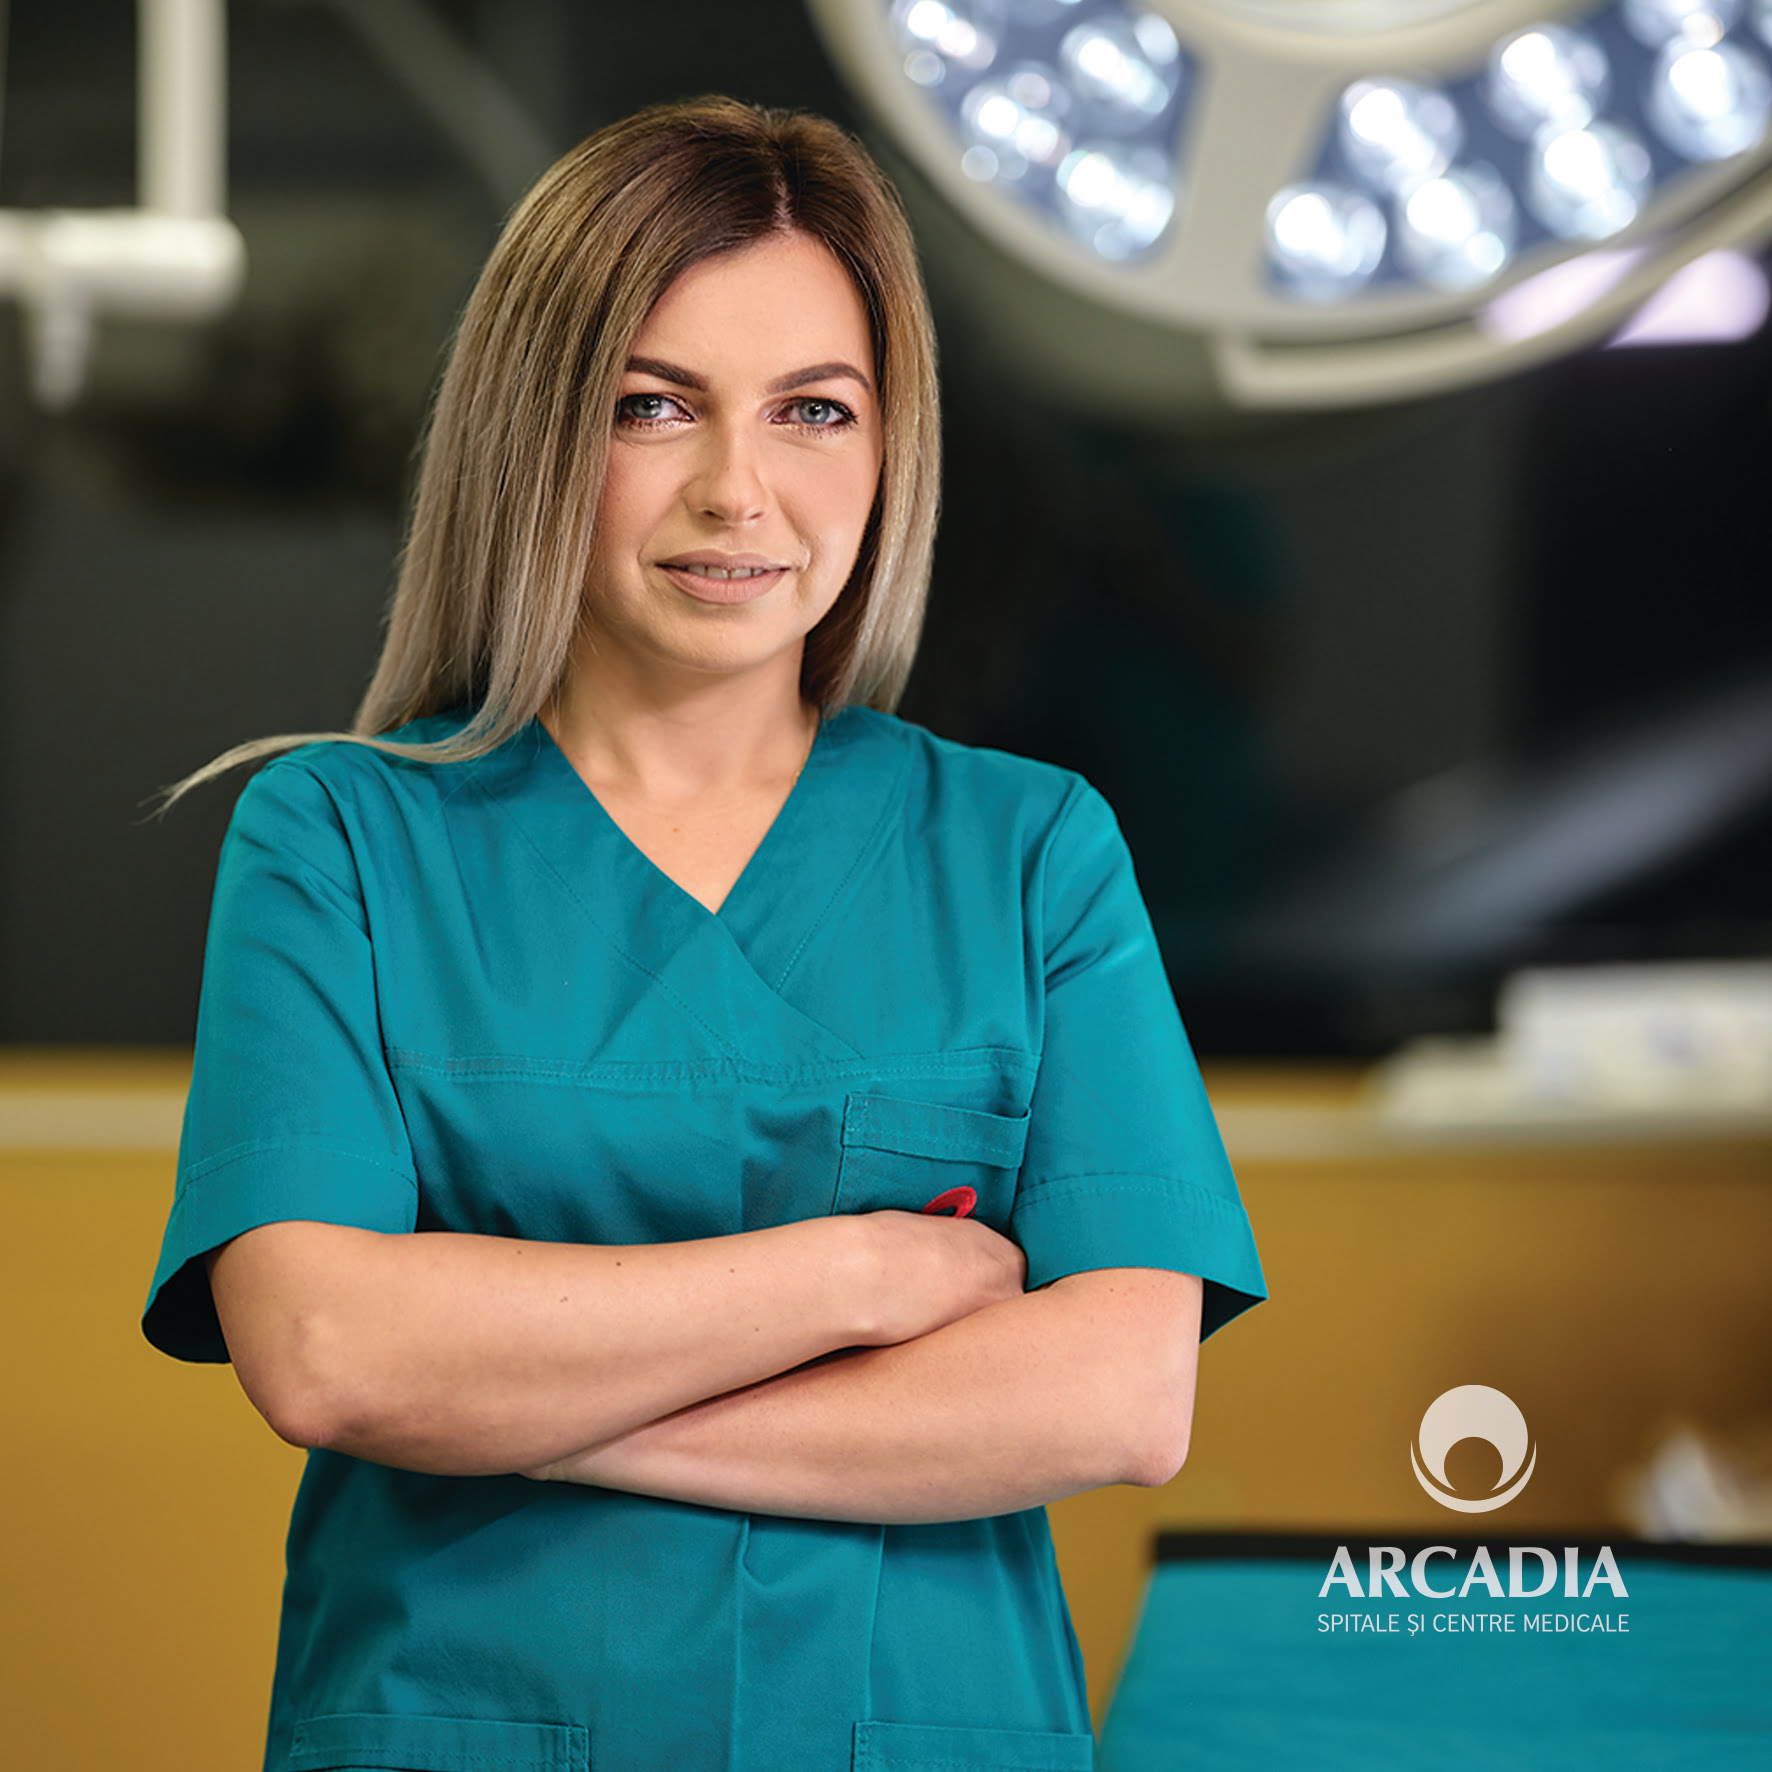 Intervenții chirurgicale asupra amigdalelor: mituri și realități